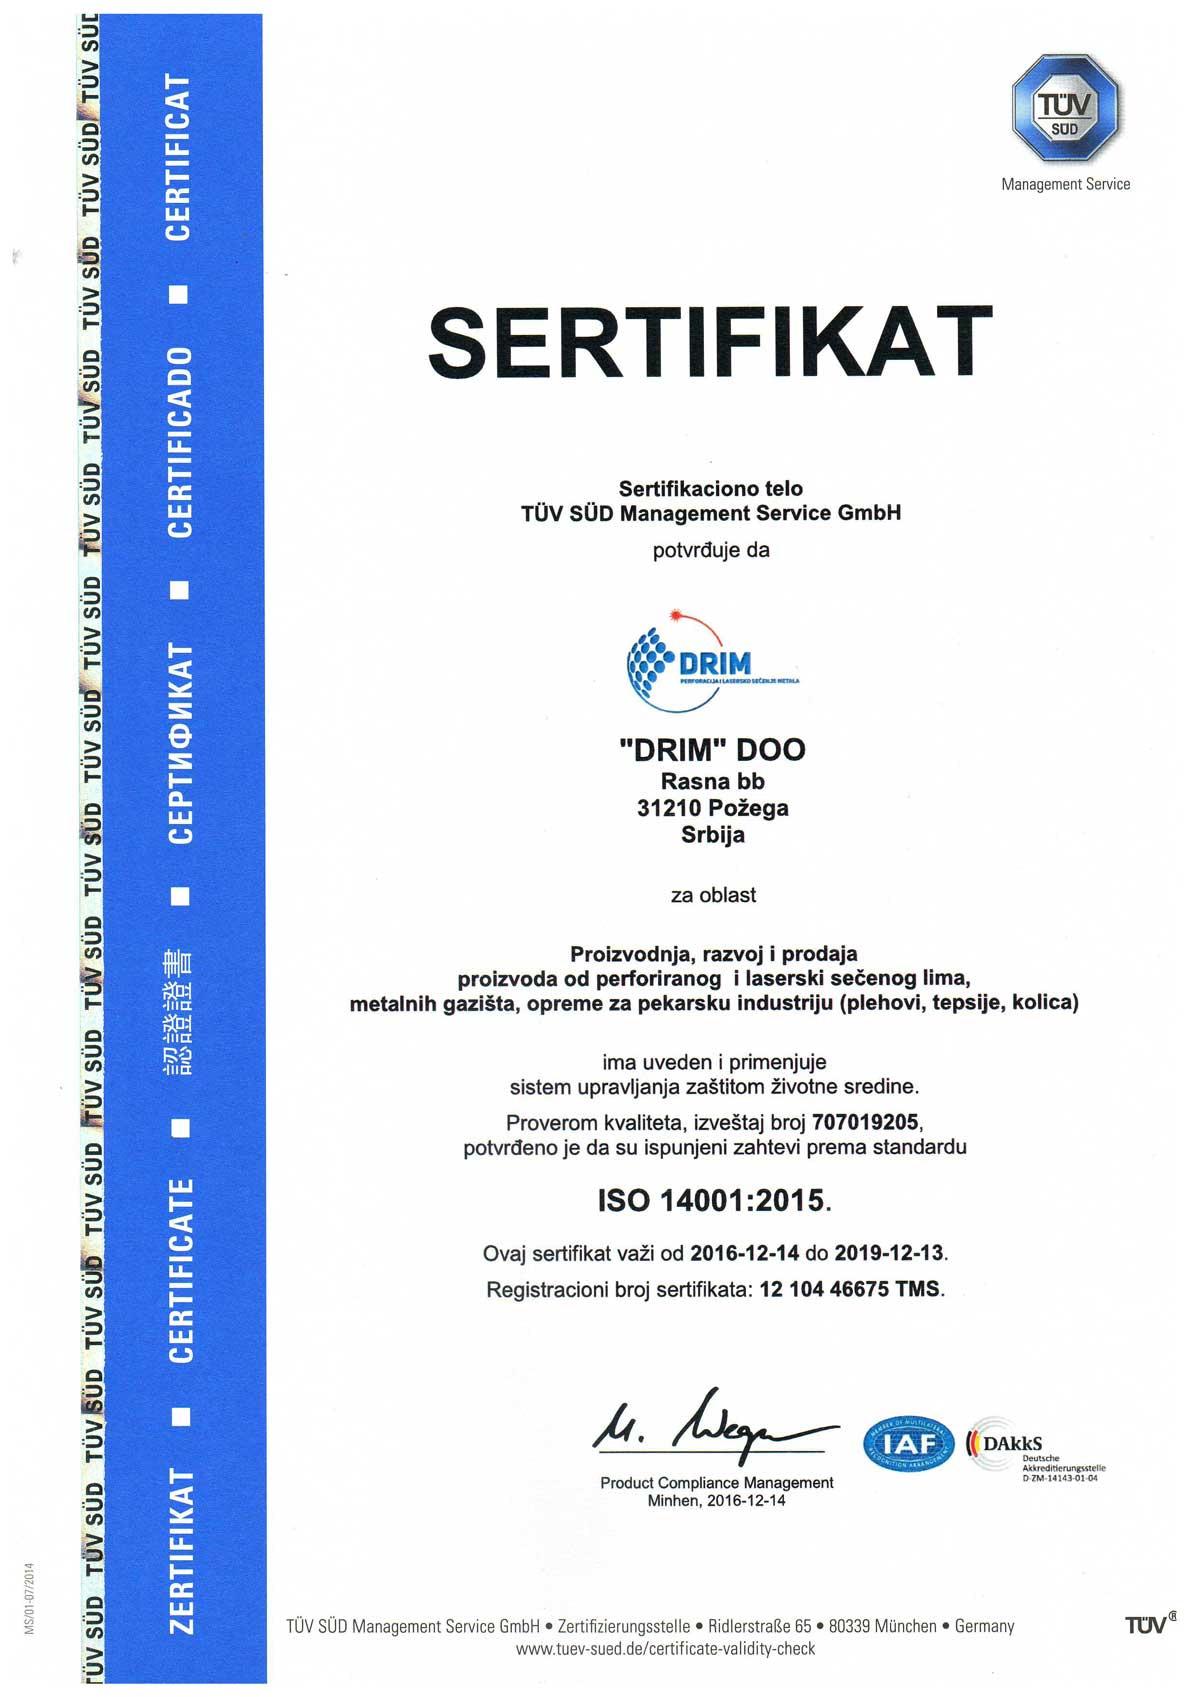 iso 1400:1 sertifikat